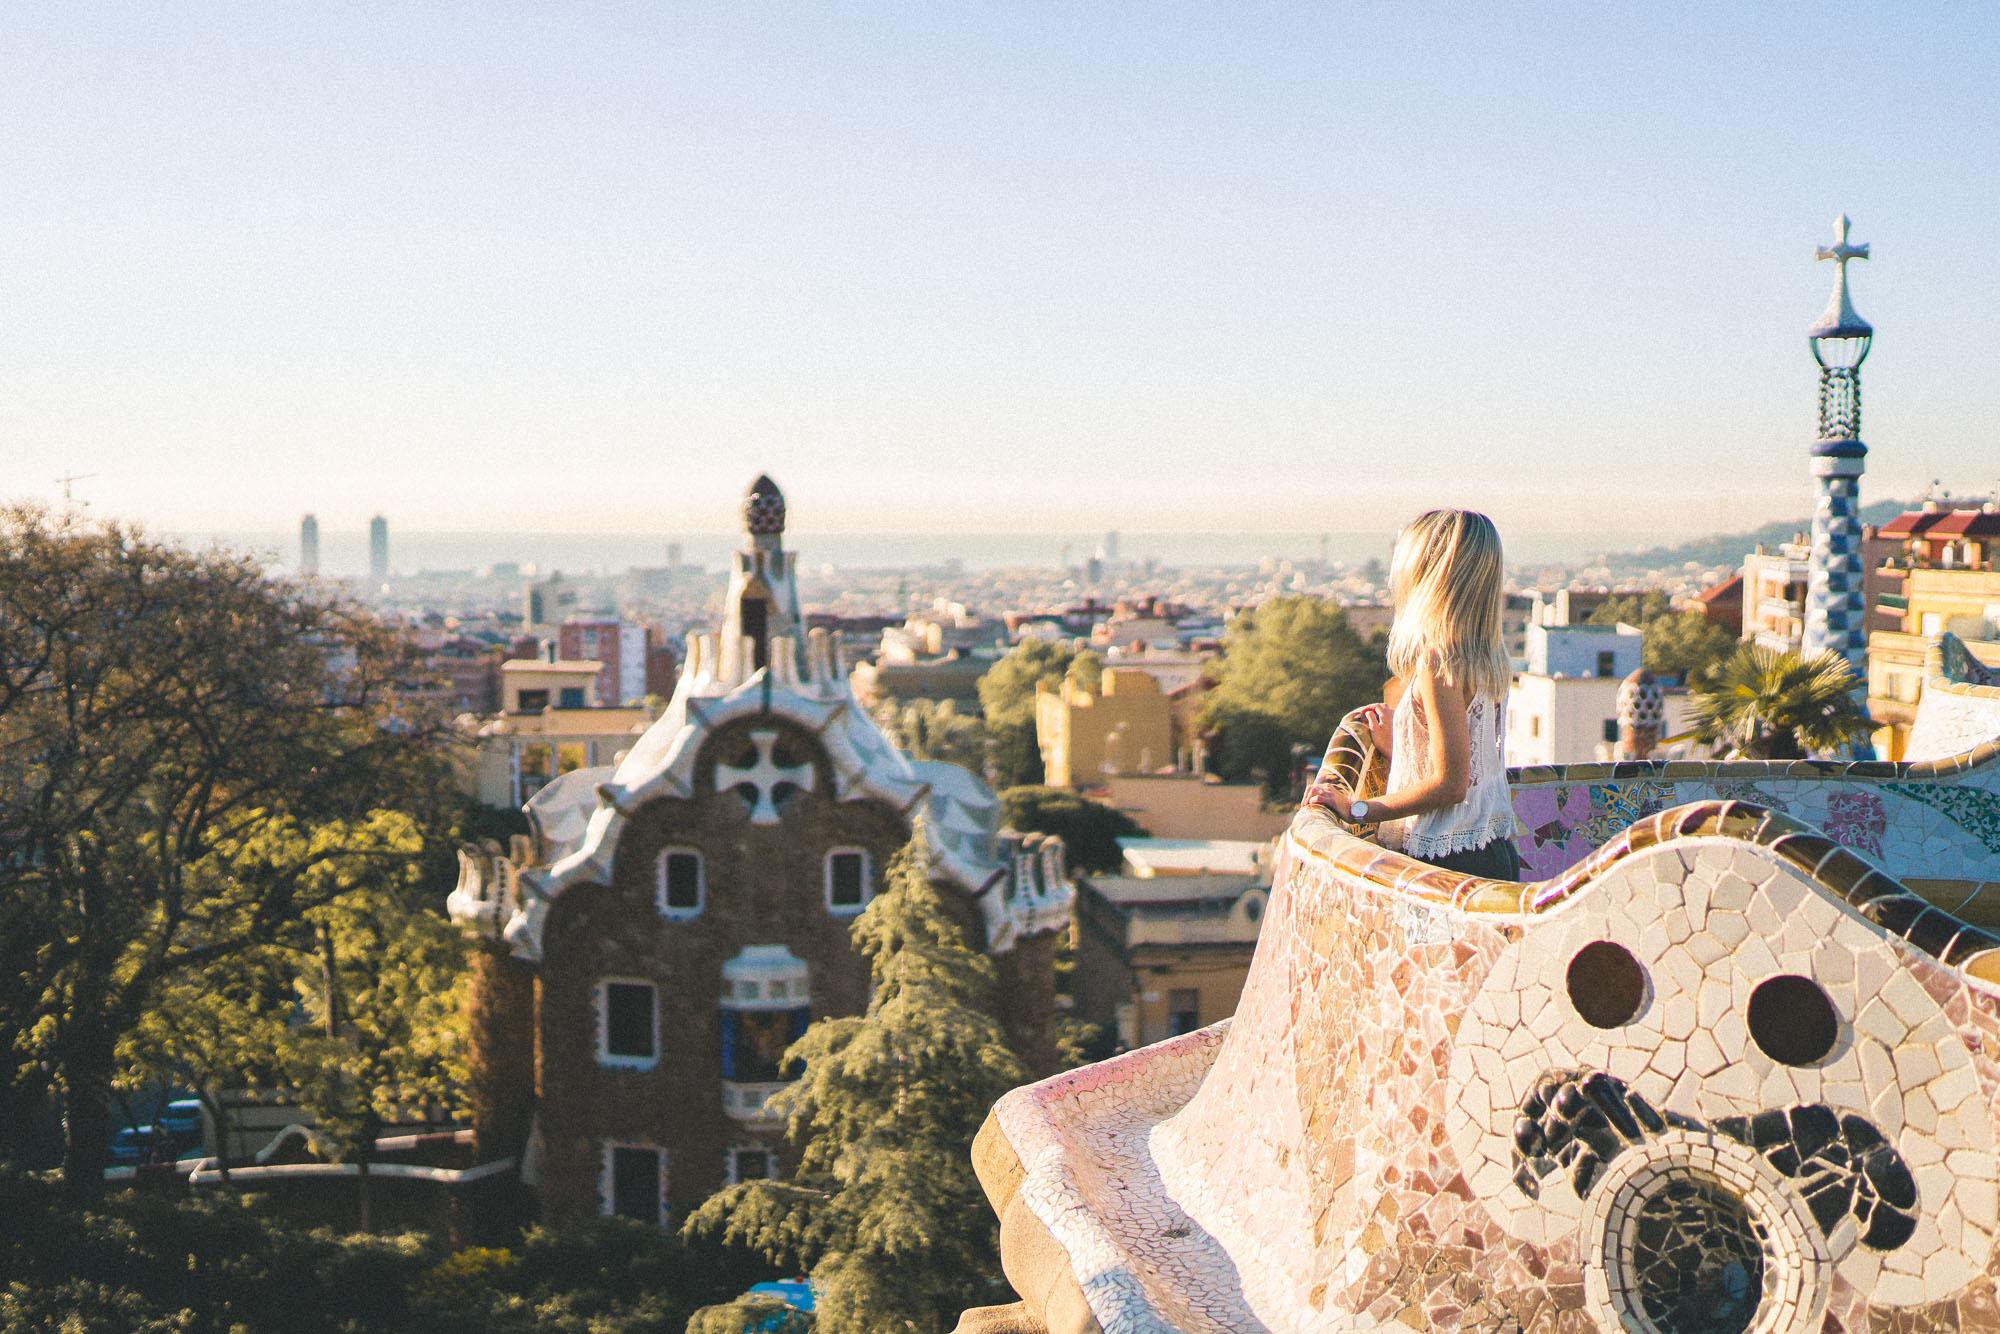 Park Guell - Gaudi Architecture garden in Barcelona, Spain